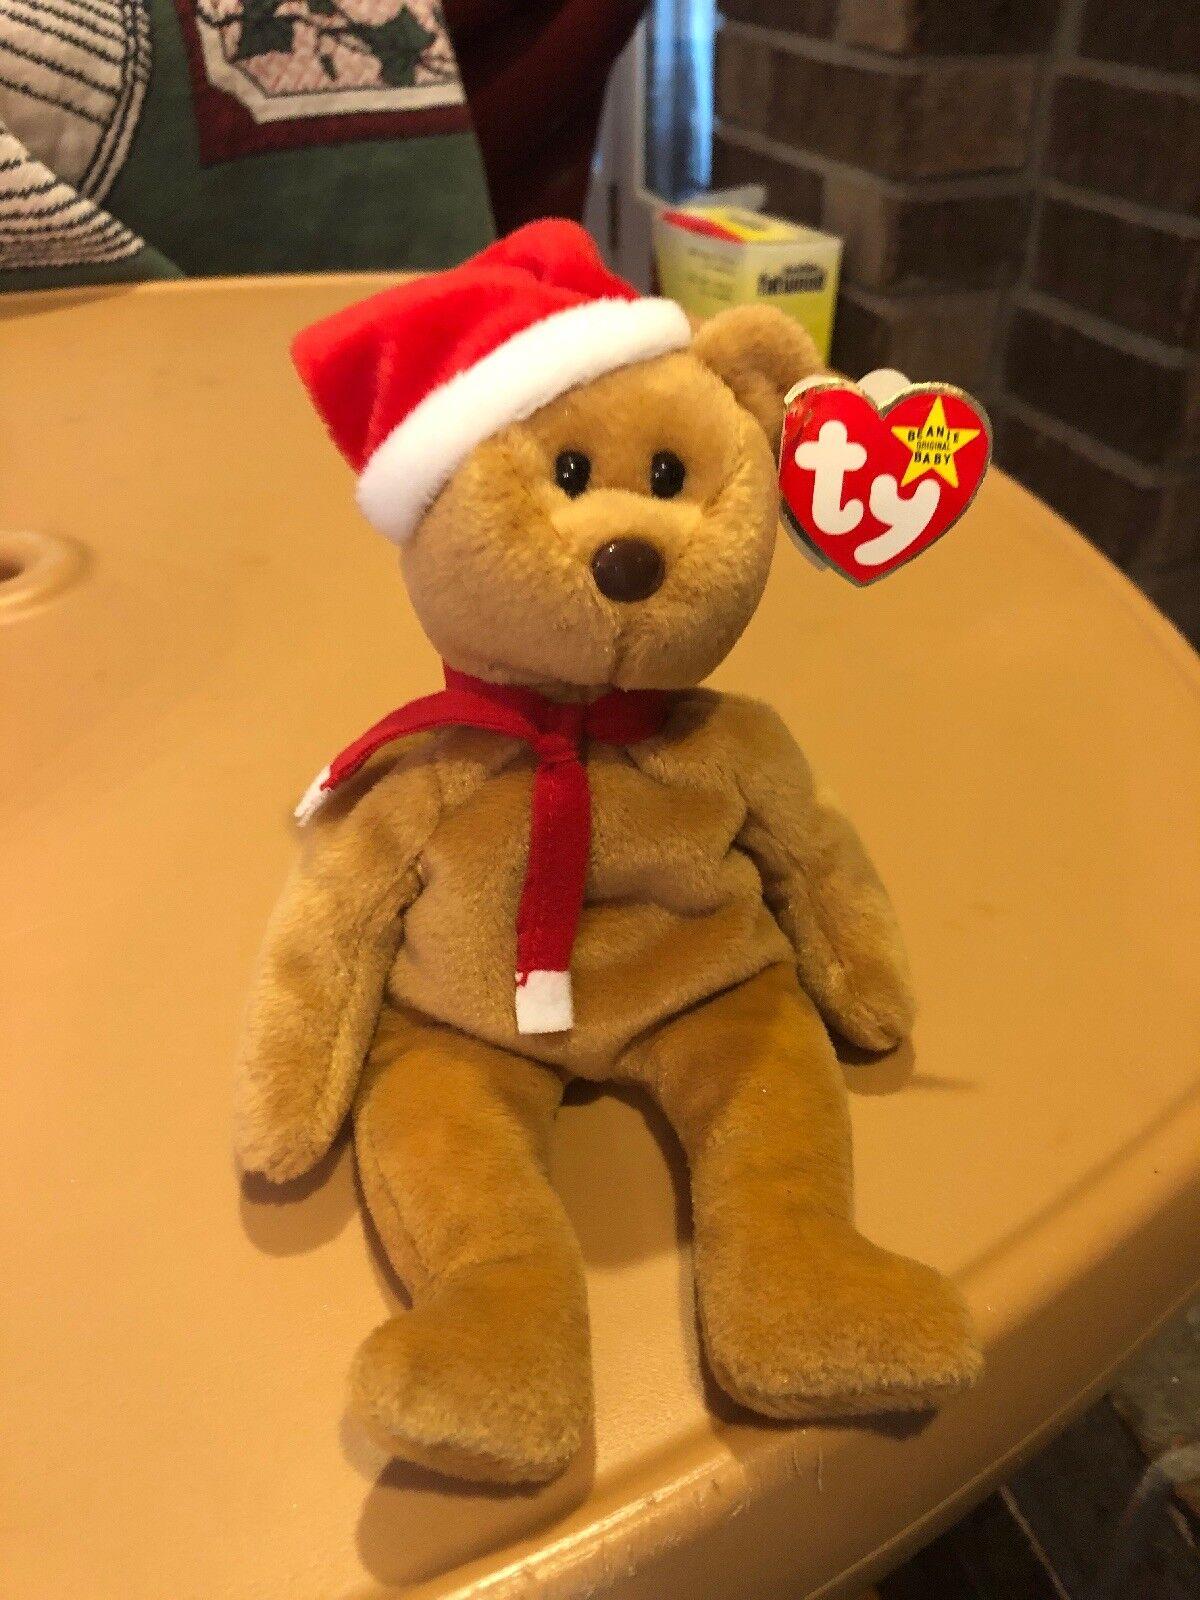 1997 Teddy Ty Beanie Baby Bear RARE with Tag Errors 1996 Style 4200